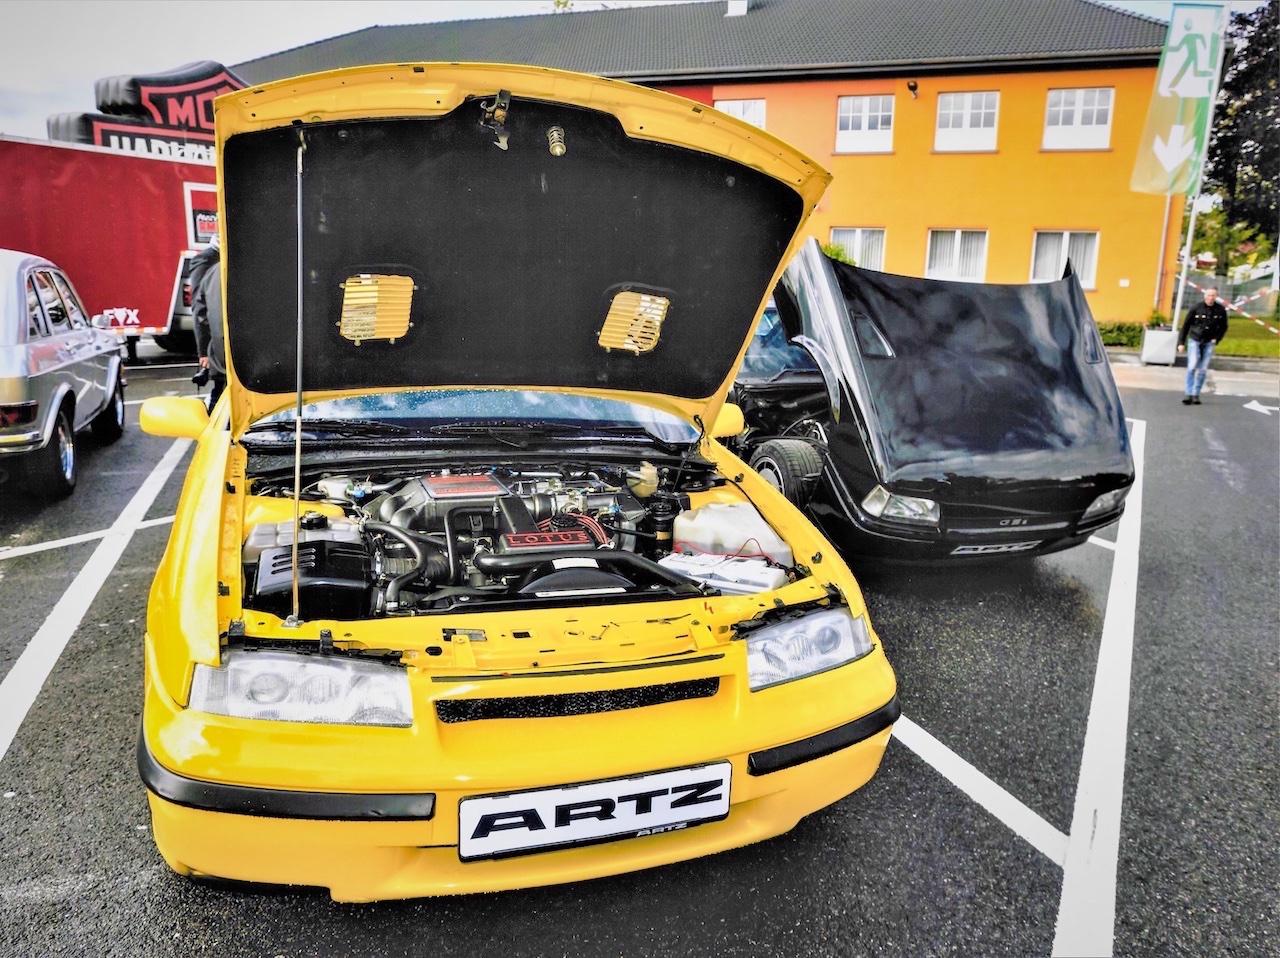 Artz Opel Calibra Lotus... Oui, Calibra ! 31